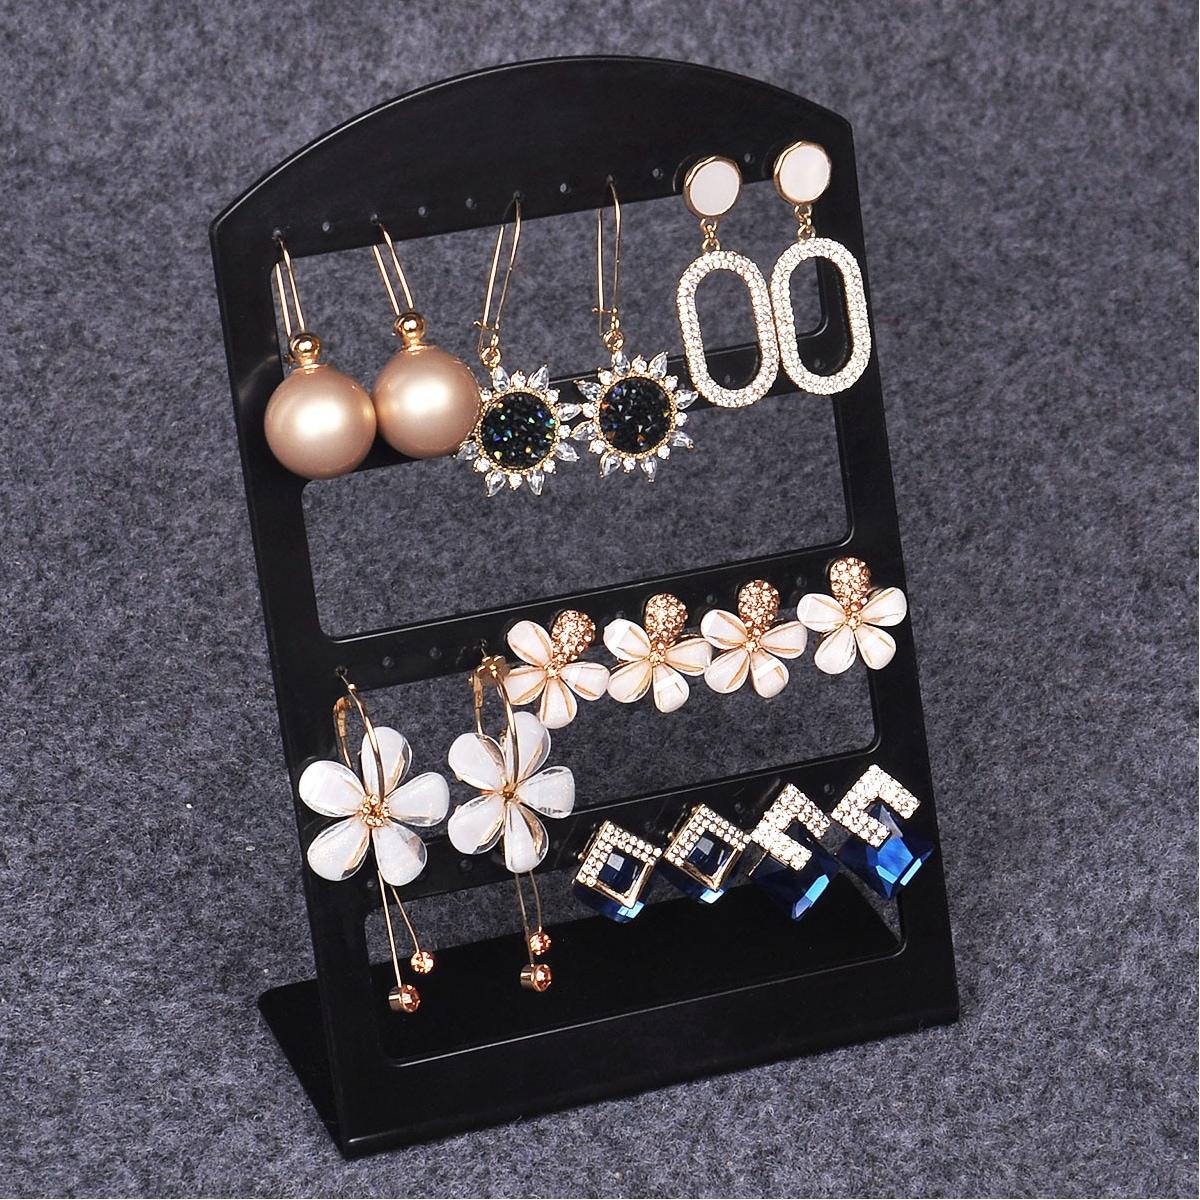 2pcs Jewelry Display Rack